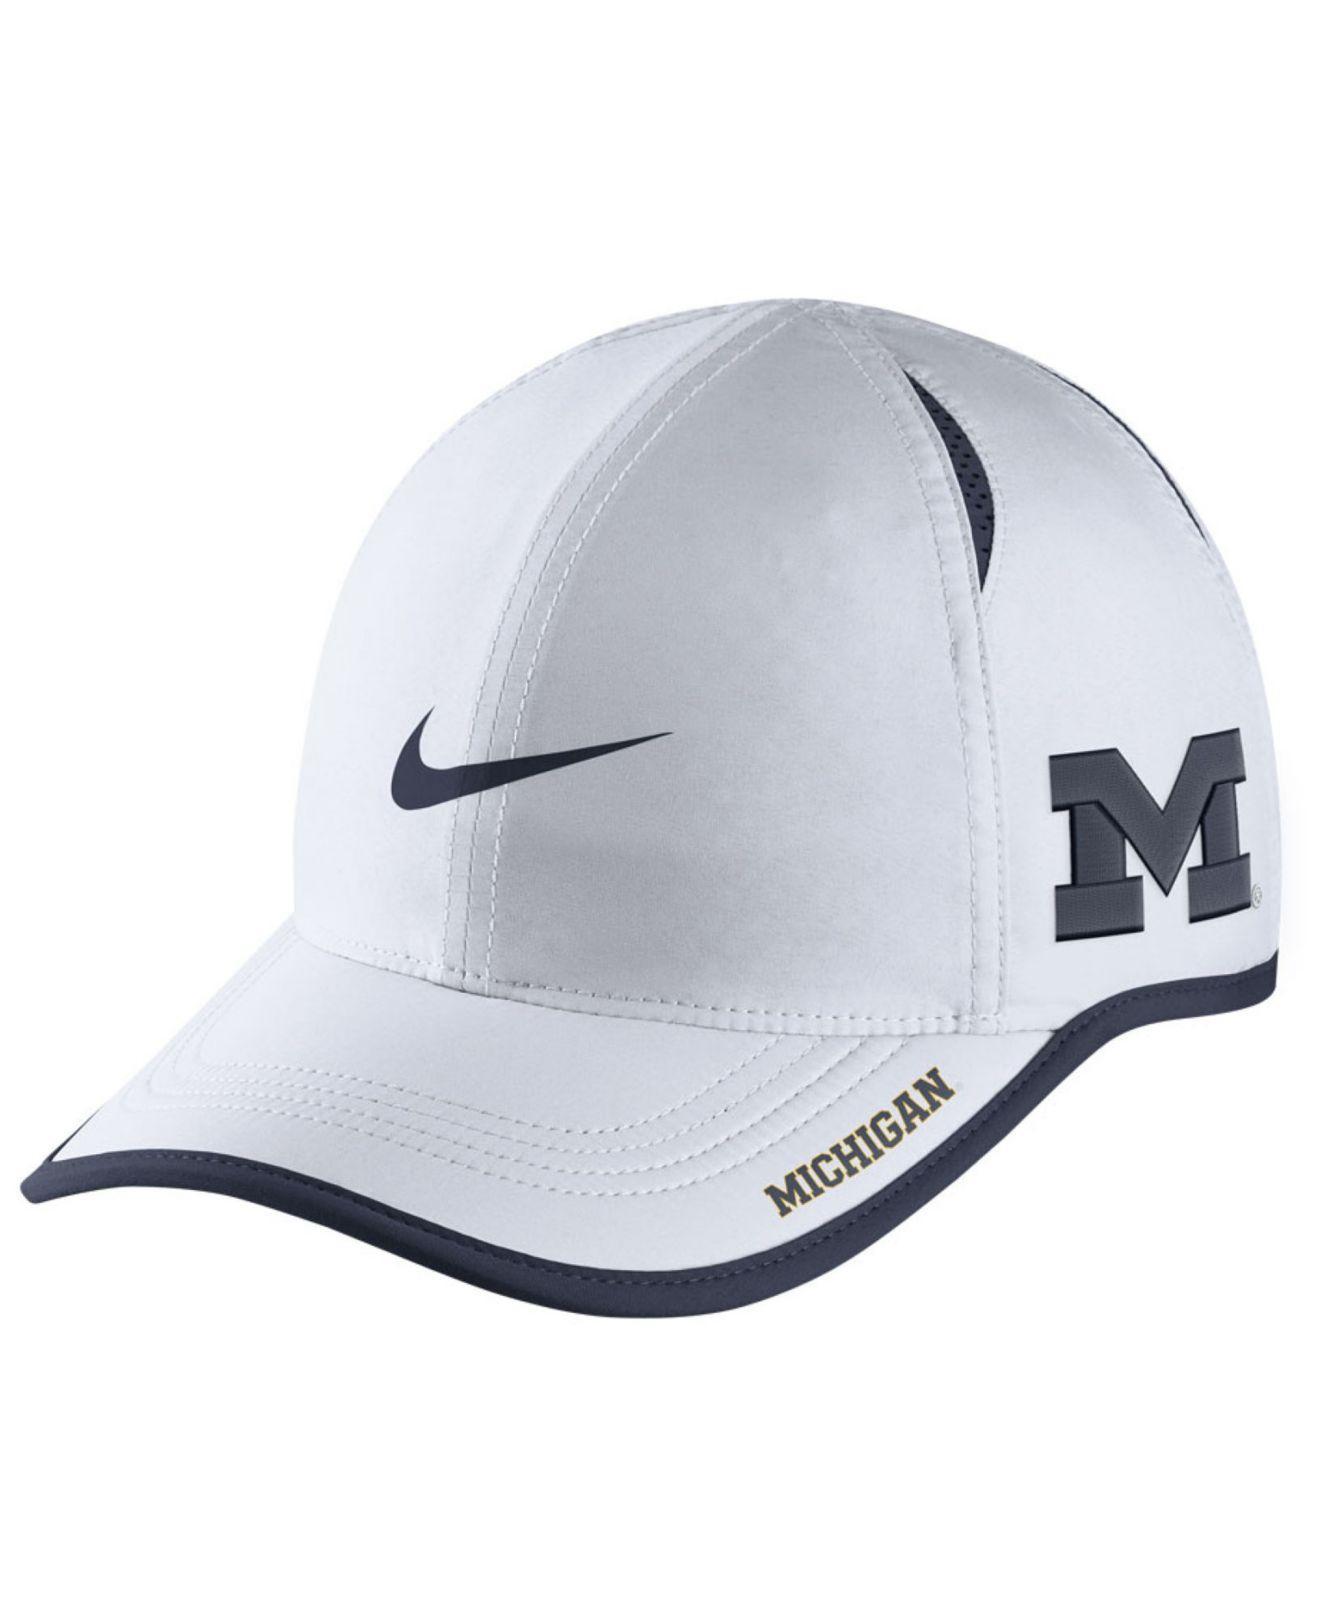 dfabcddd091 Lyst - Nike Michigan Wolverines Featherlight Cap in White for Men